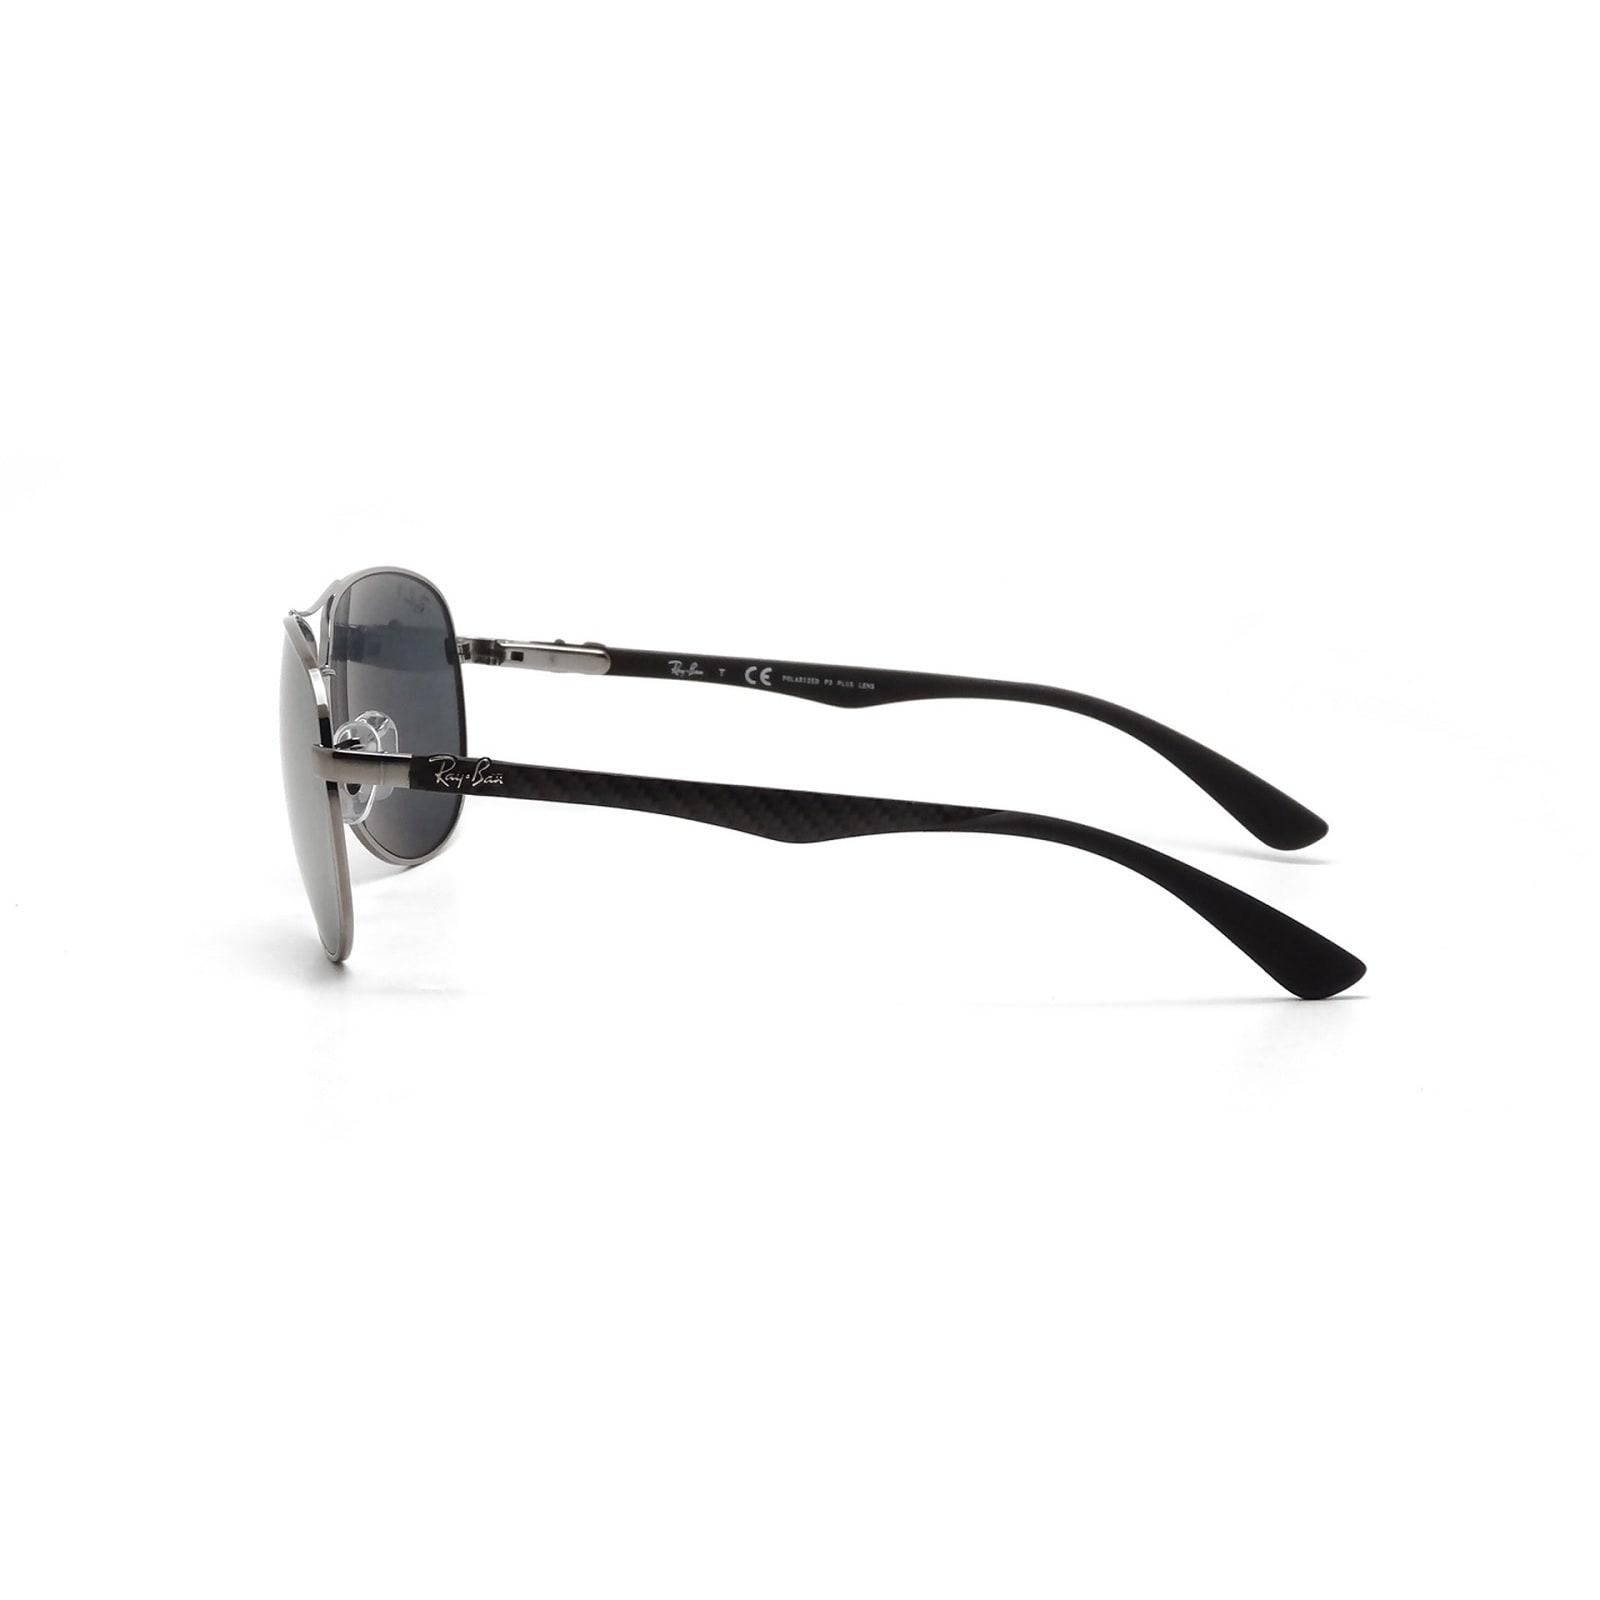 ec0e3e61fc2 Shop Ray-Ban RB8313 004 K6 Gunmetal Frame Polarized Silver Mirror 58mm Lens  Sunglasses - Free Shipping Today - Overstock - 15614447